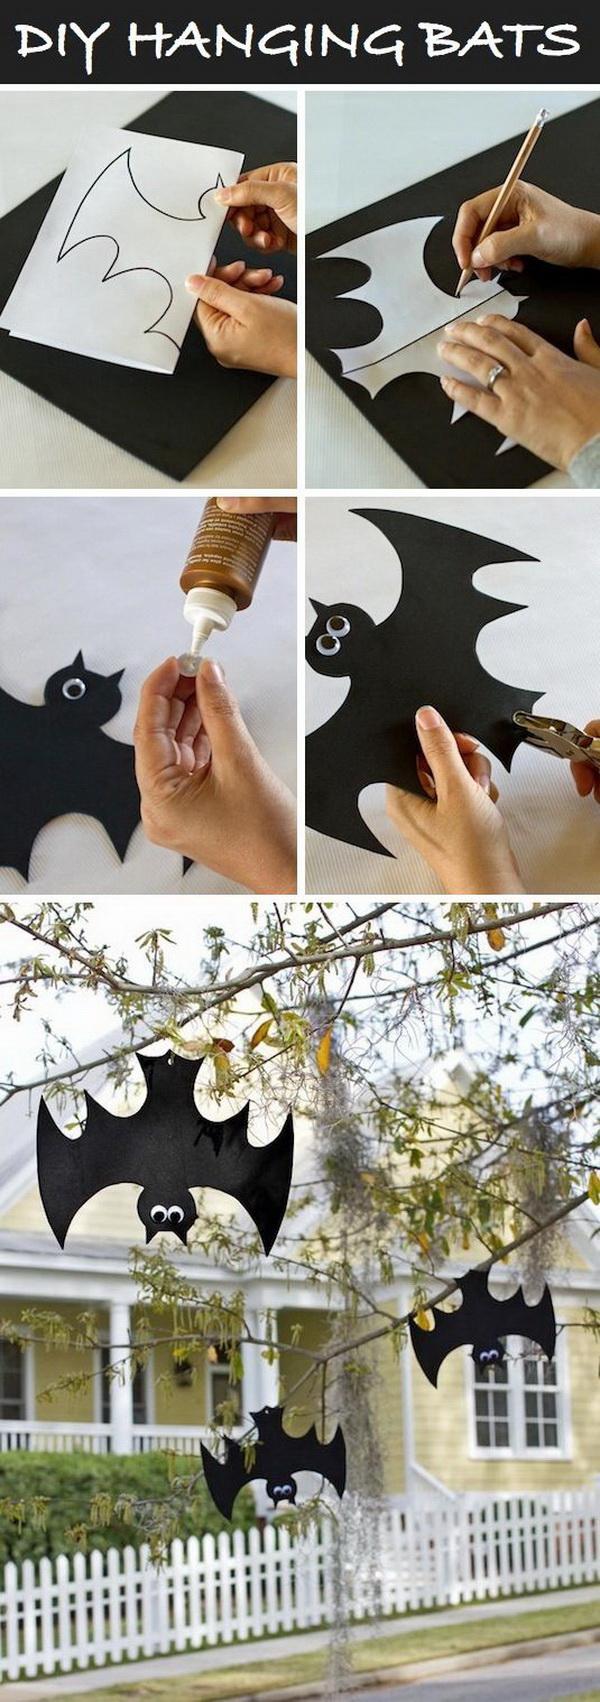 DIY Hanging Bats.